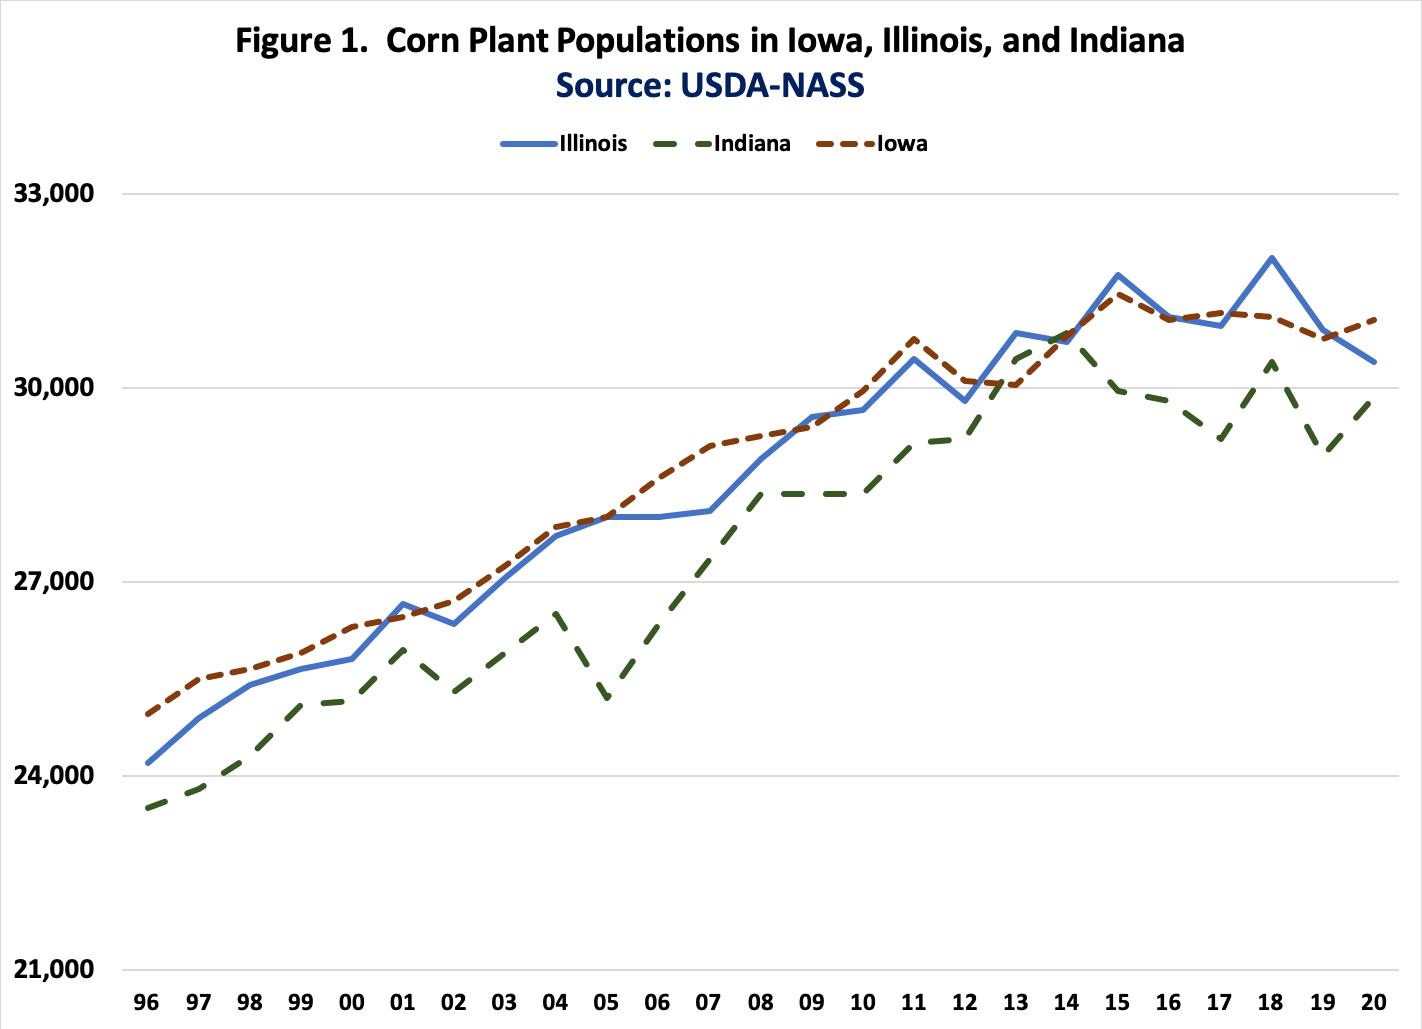 Figure 1.  Corn Plant Populations in Iowa, Illinois, and Indiana Source: USDA-NASS